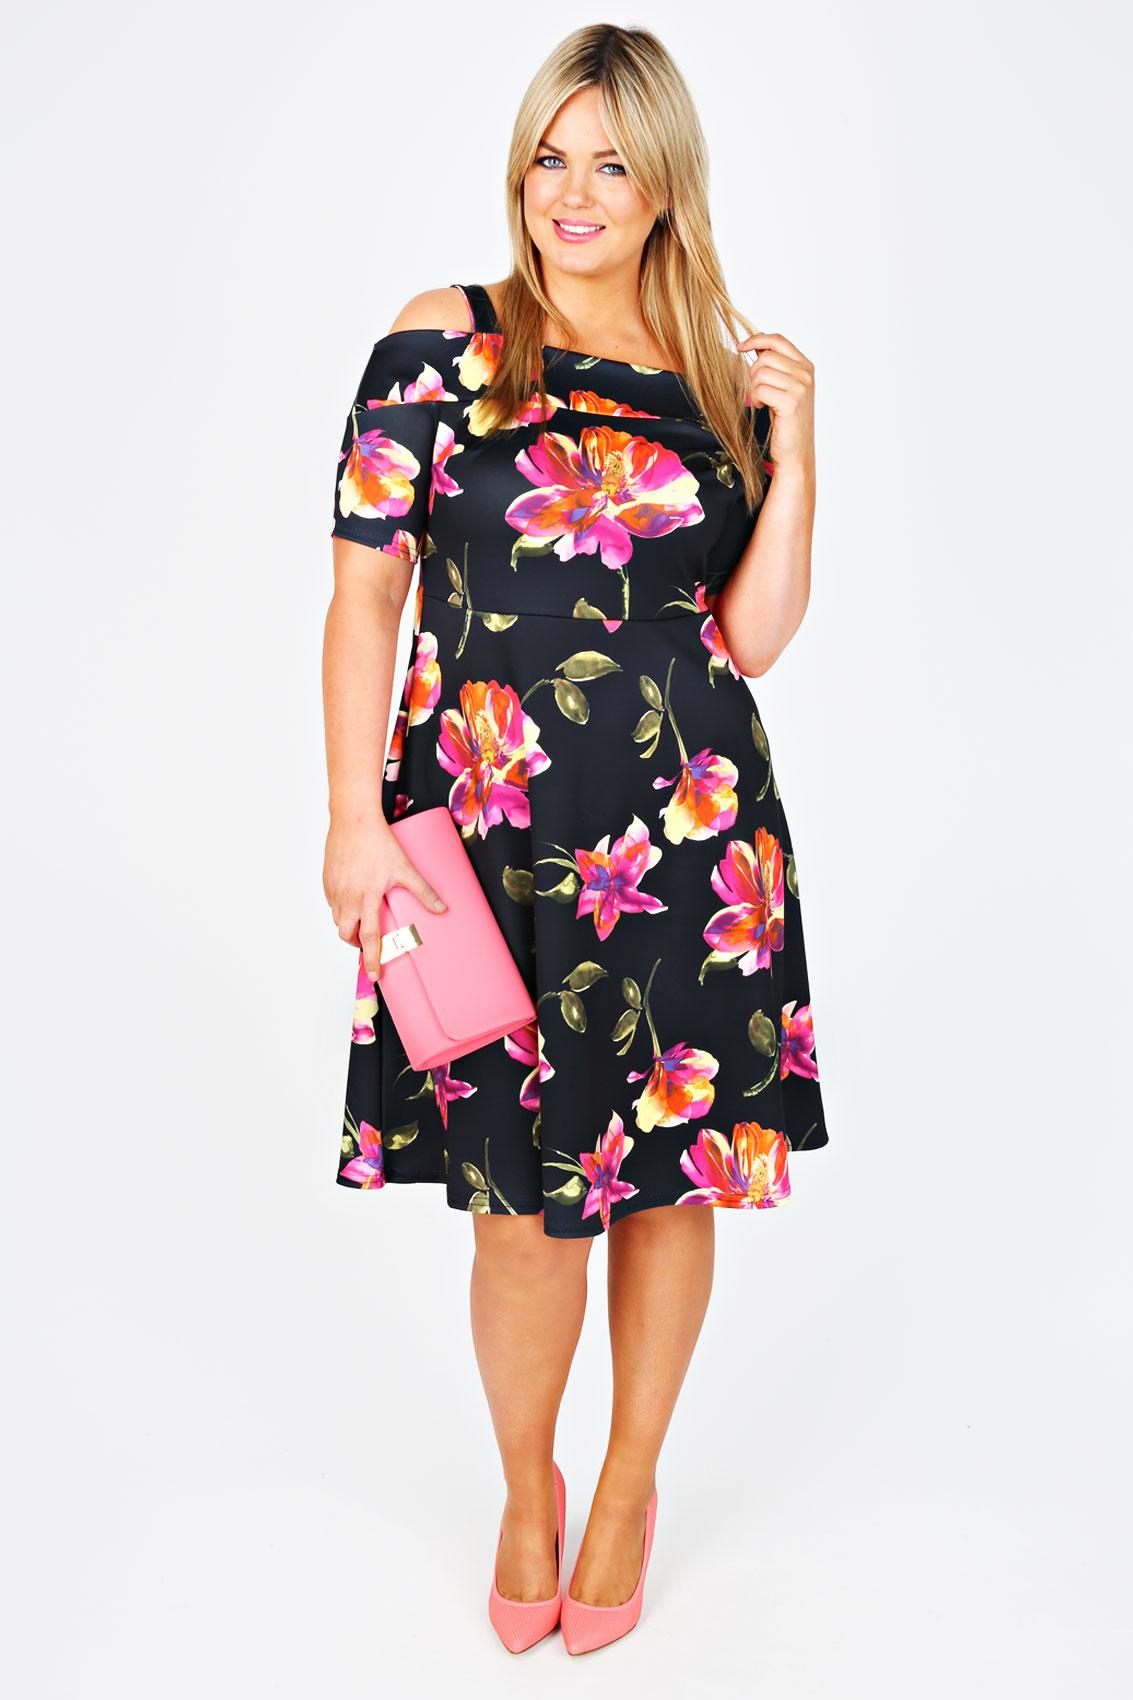 Cocktail Dresses Size 18 Pink - Boutique Prom Dresses